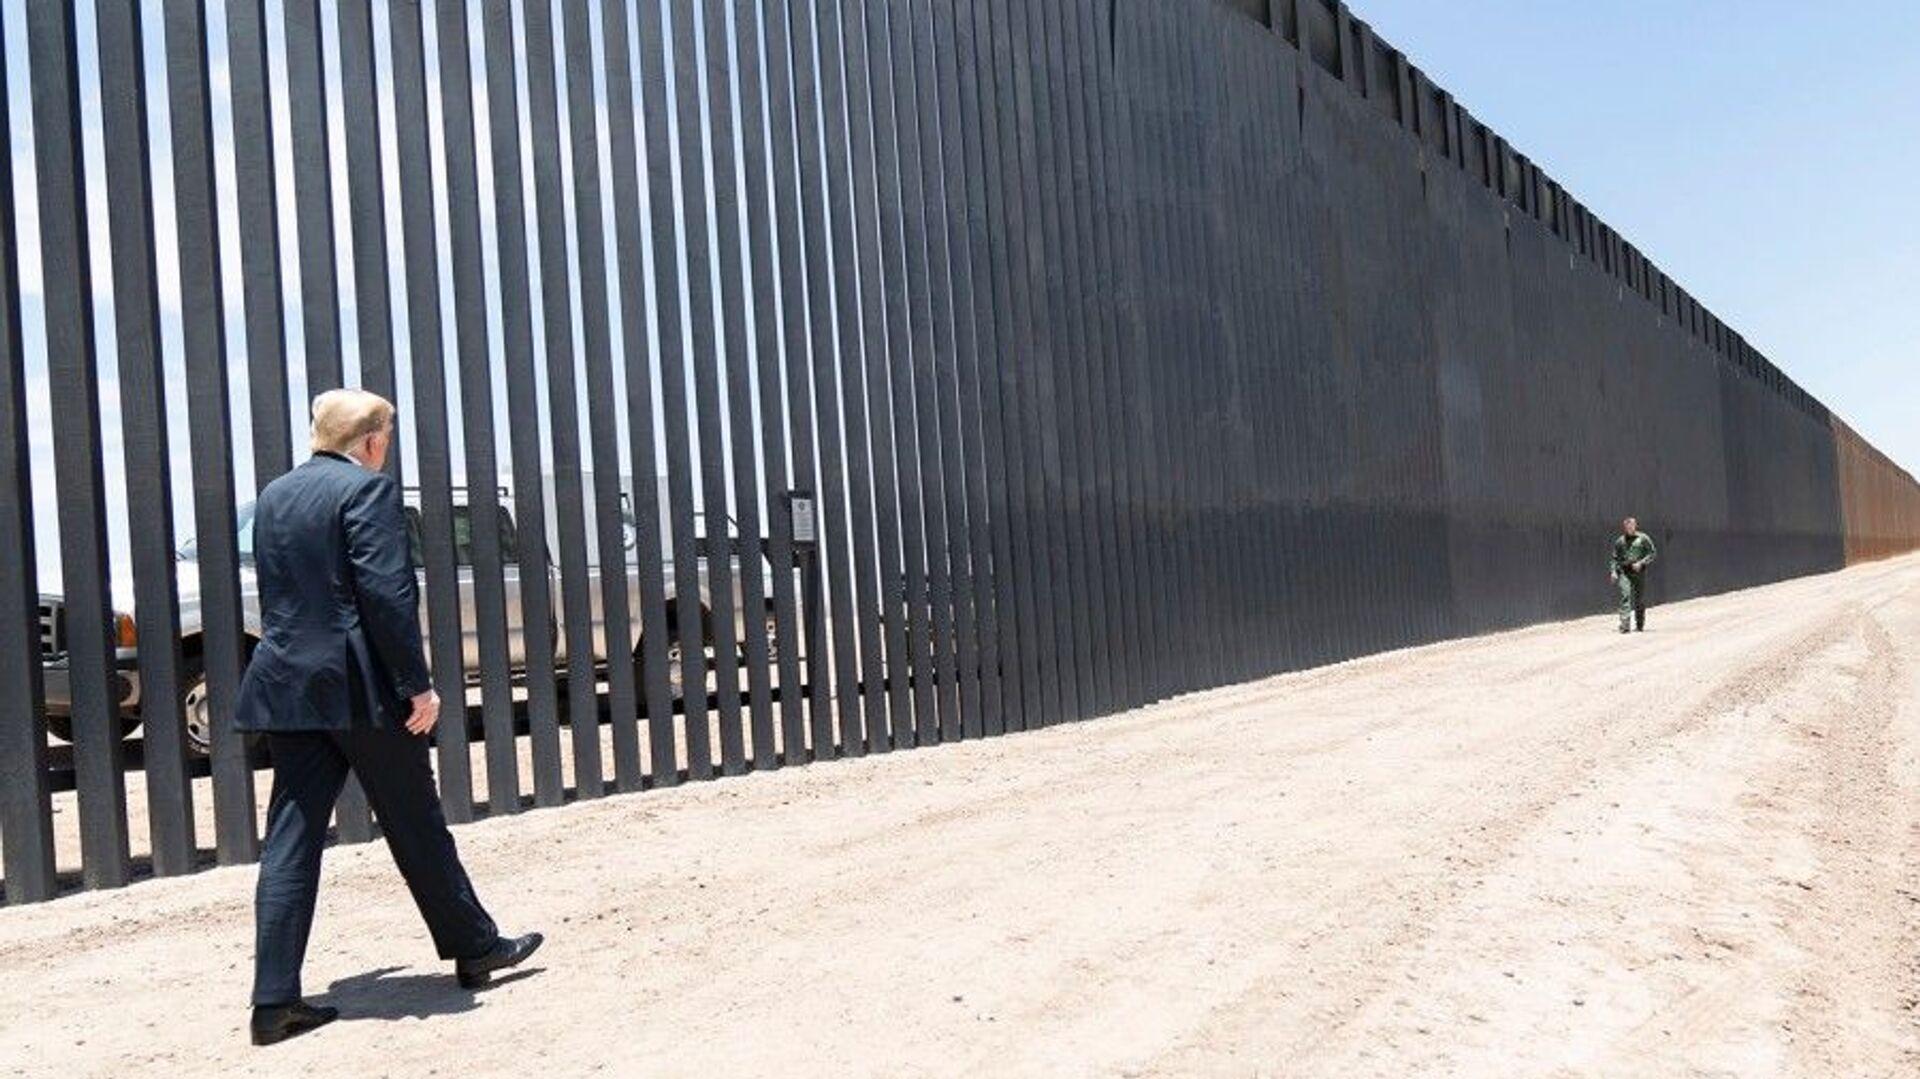 President Donald Trump walks along the completed 200th mile of new border wall on June 23, 2020, along the U.S.-Mexico border near Yuma, Arizona. - Sputnik International, 1920, 21.09.2021